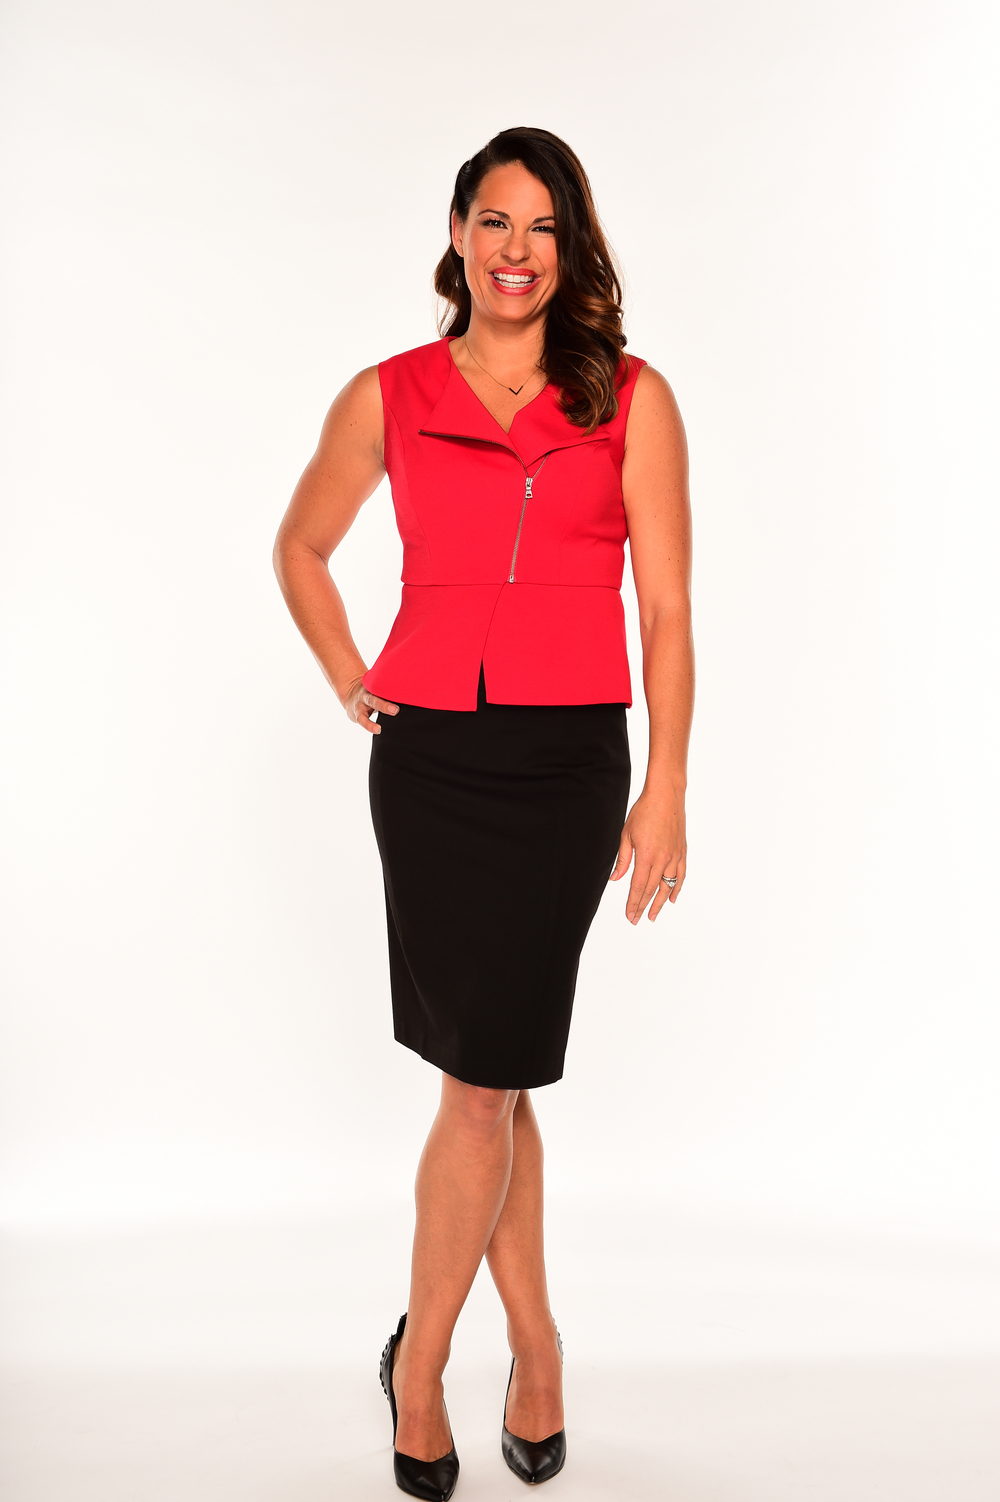 Jessica Mendoza The Hispanic Outlook-12 Magazine